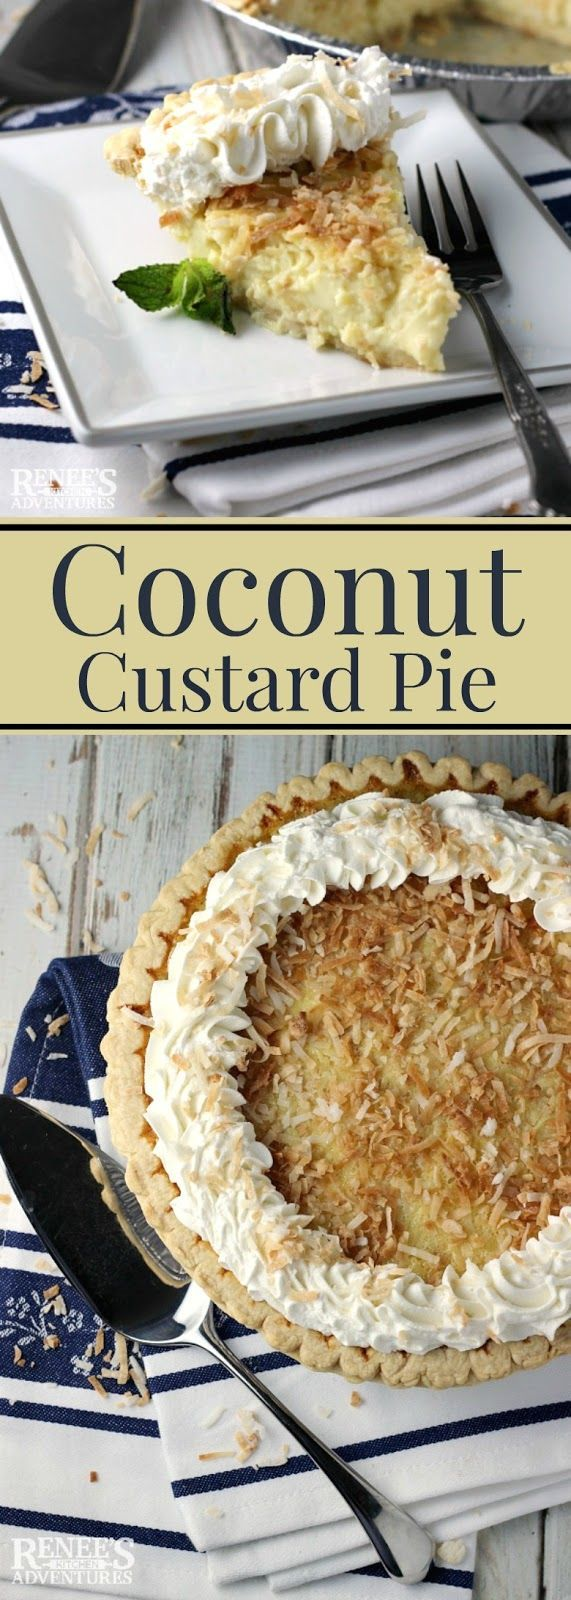 Coconut Custard Pie | Renee's Kitchen Adventures - easy dessert pie recipe for a toasted coconut custard pie made with milk, eggs and sugar. #SundaySupper